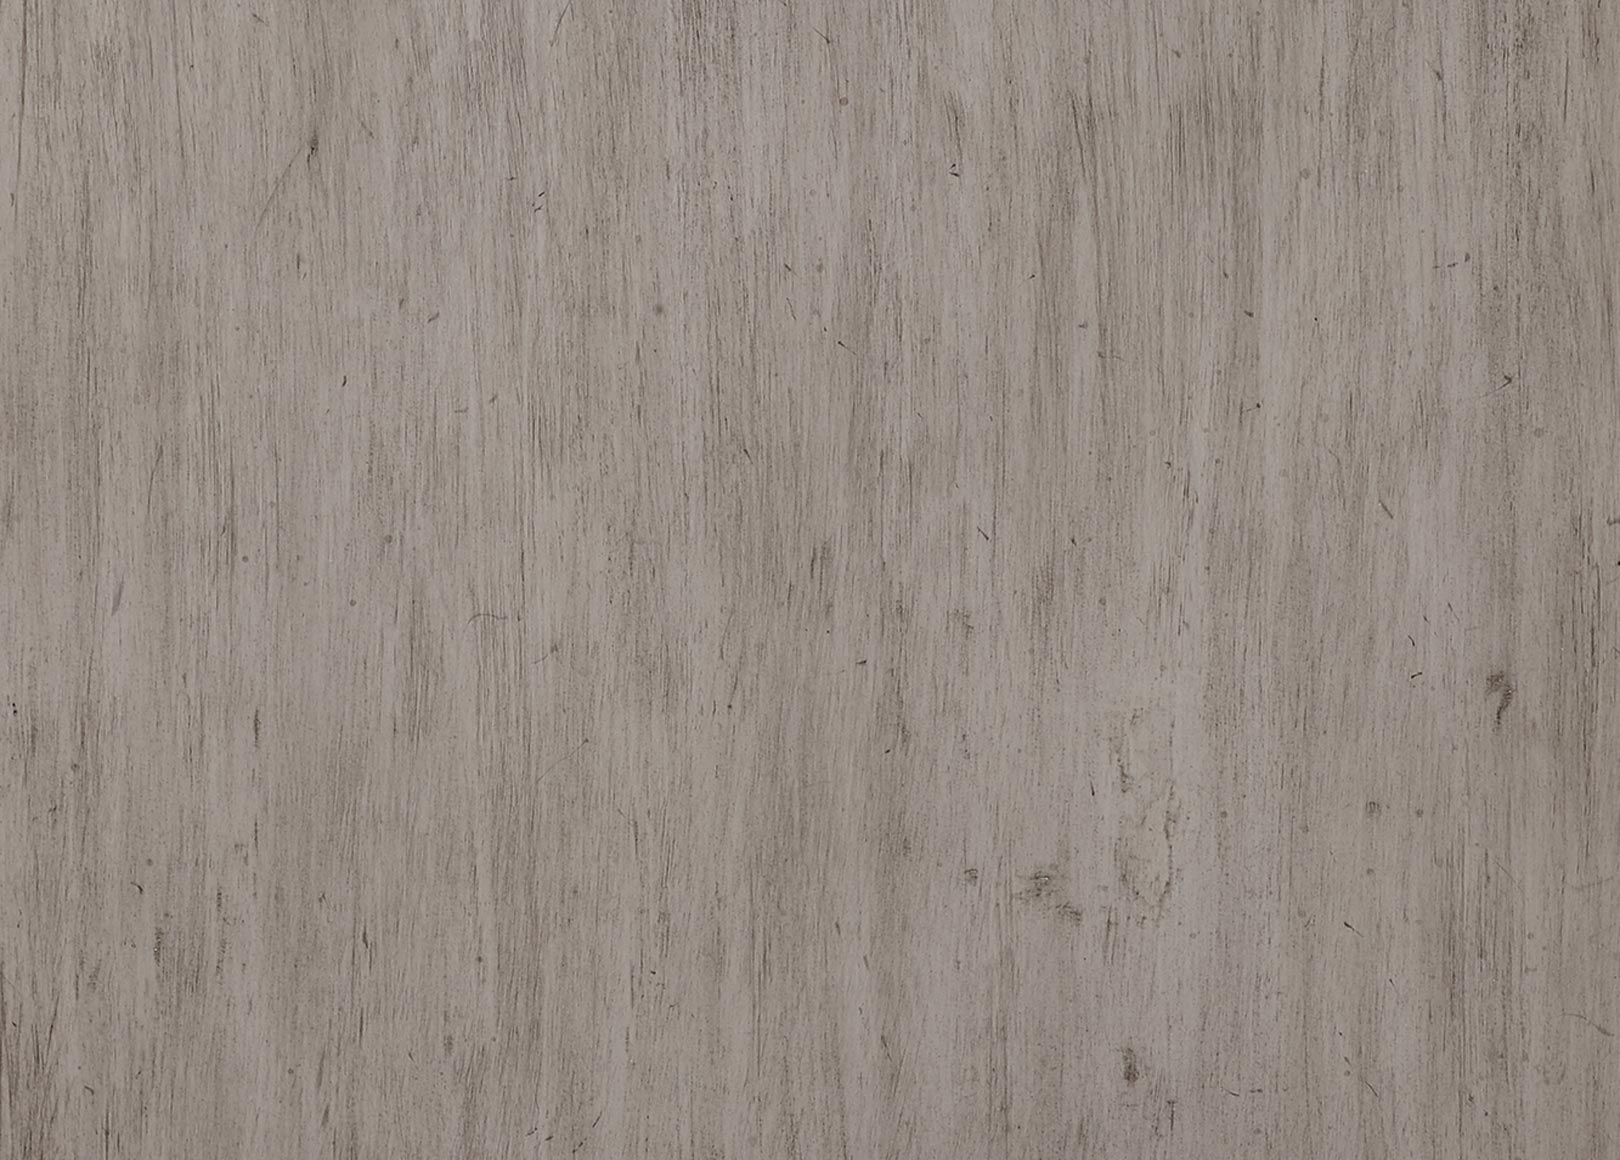 Marble Gray 377 Finish Sample